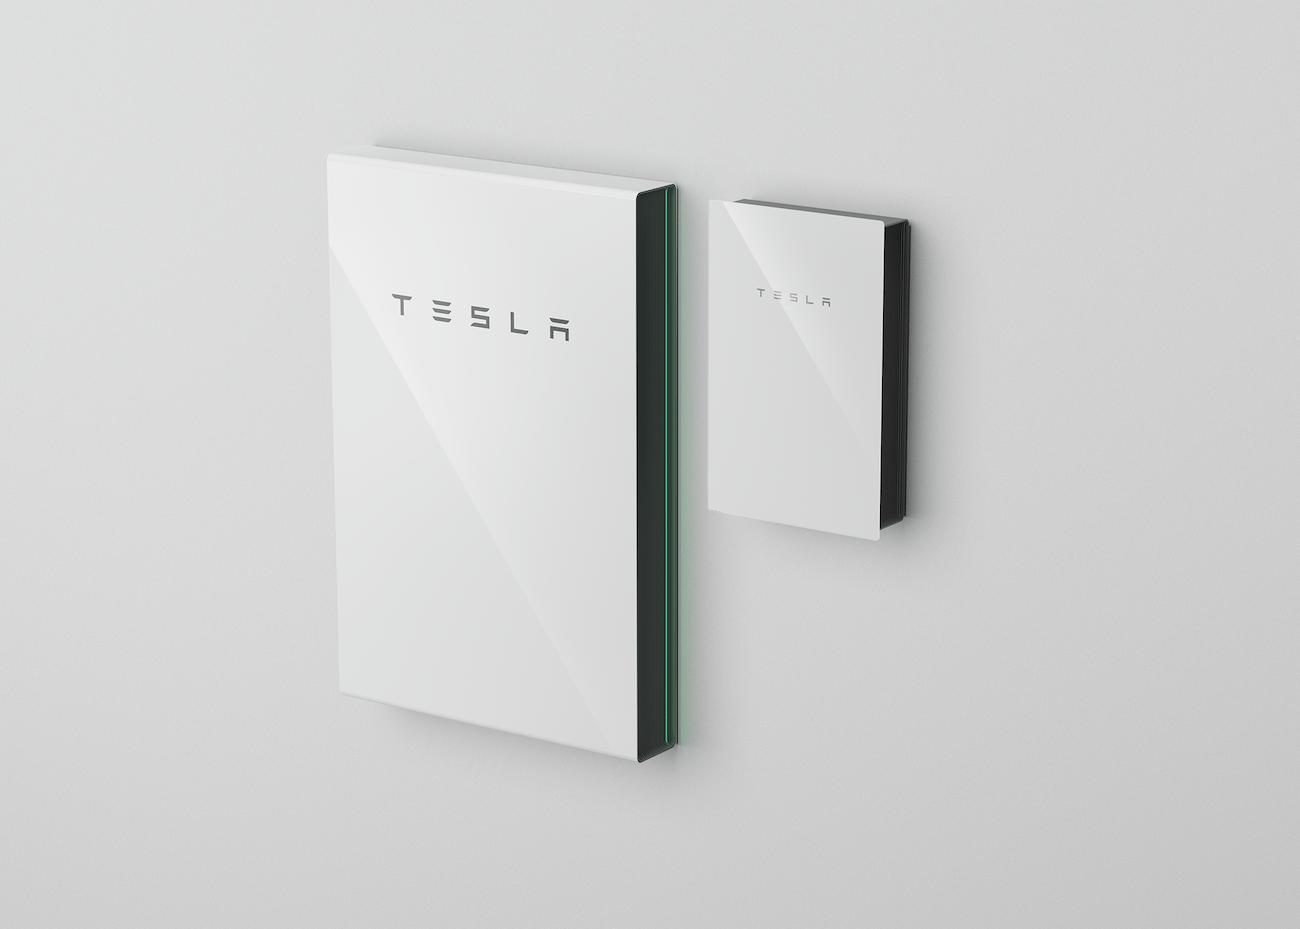 Tesla's new Backup Gateway 2.